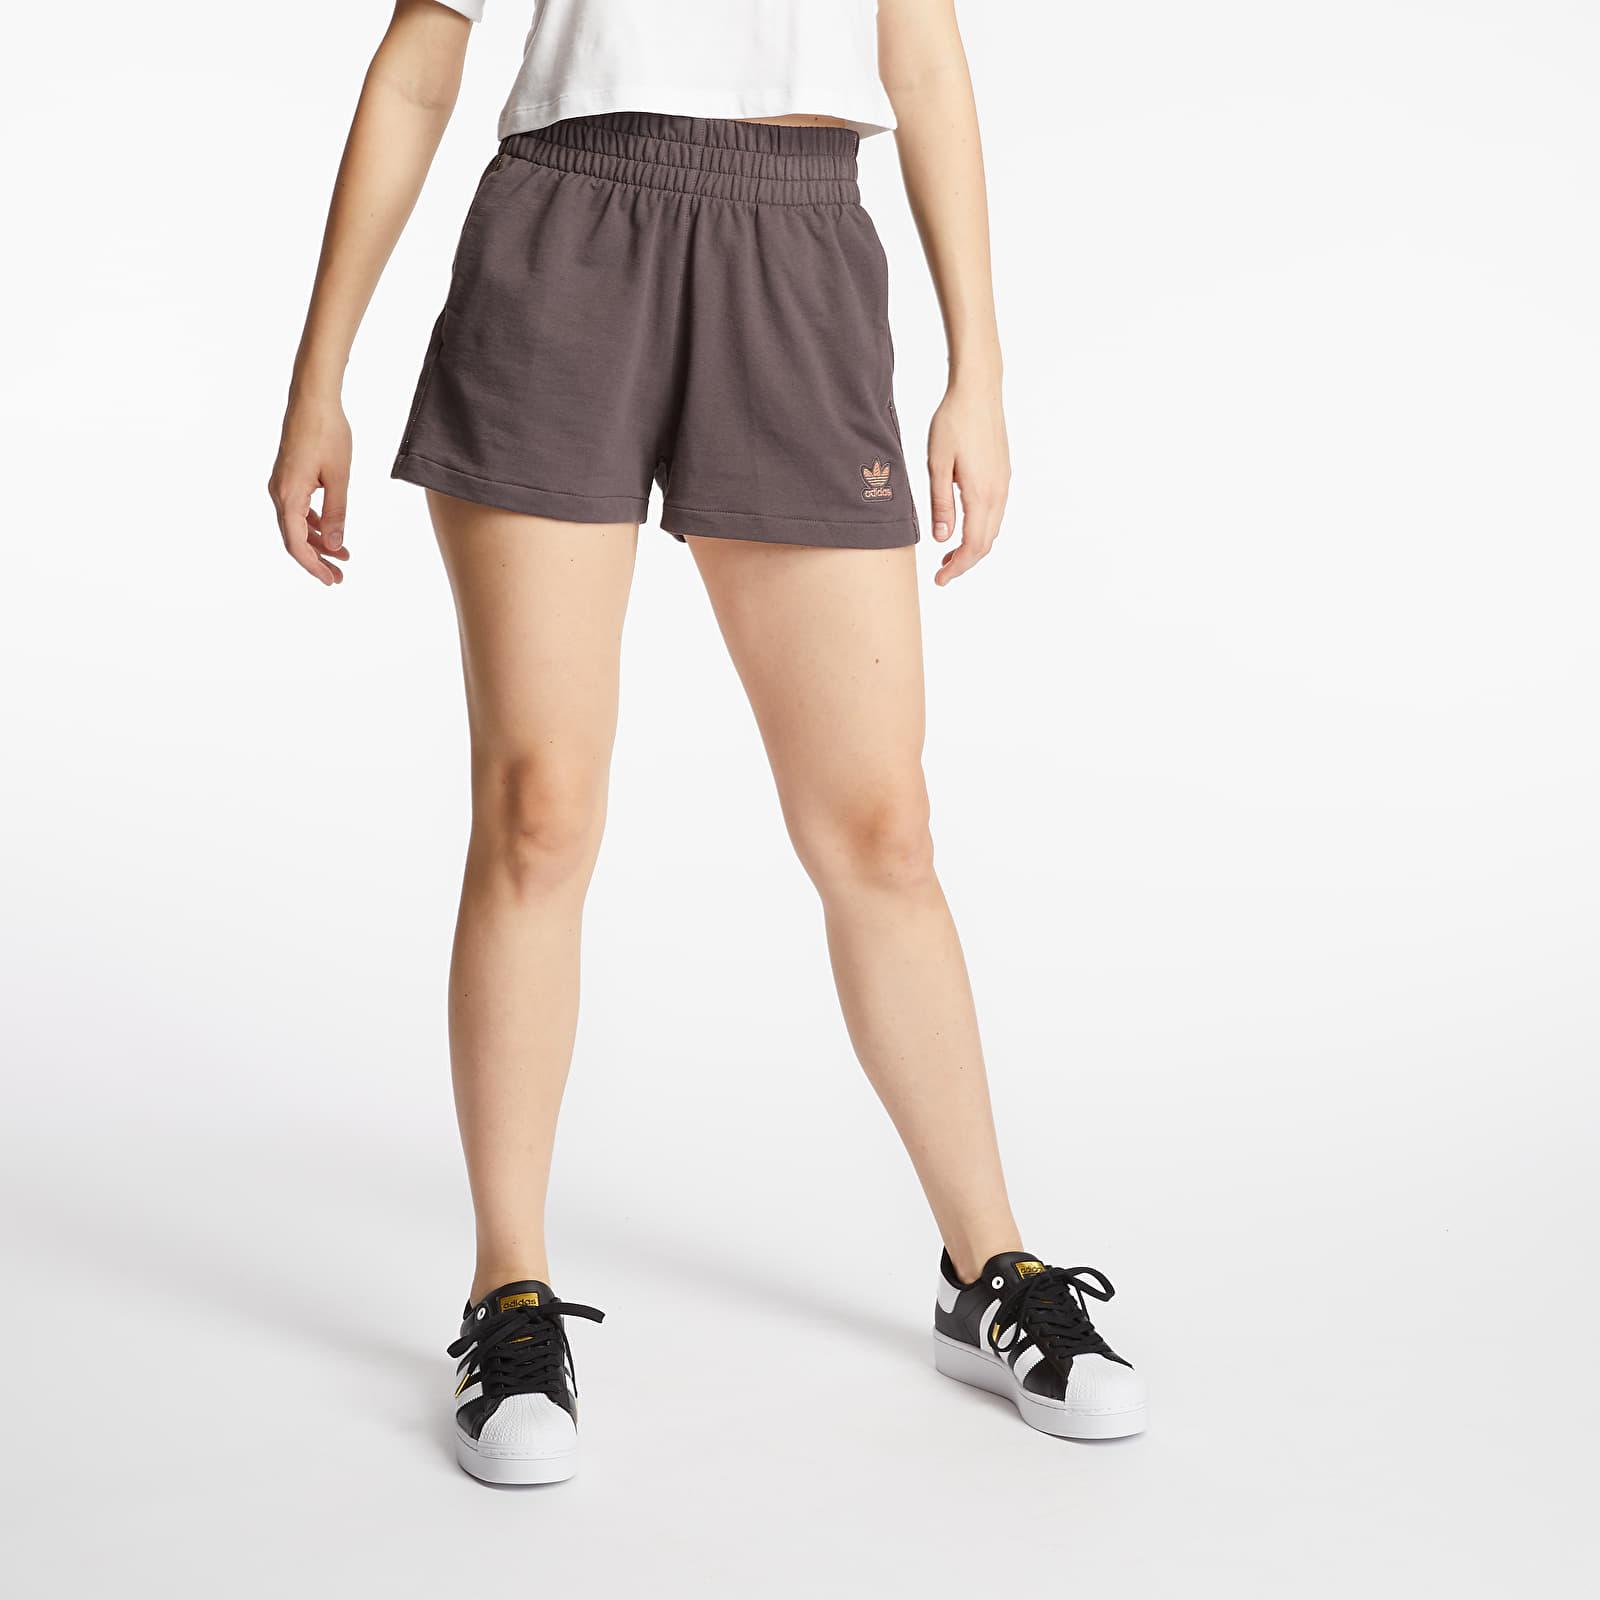 Šortky adidas 3 Stripes Shorts Urban Trail